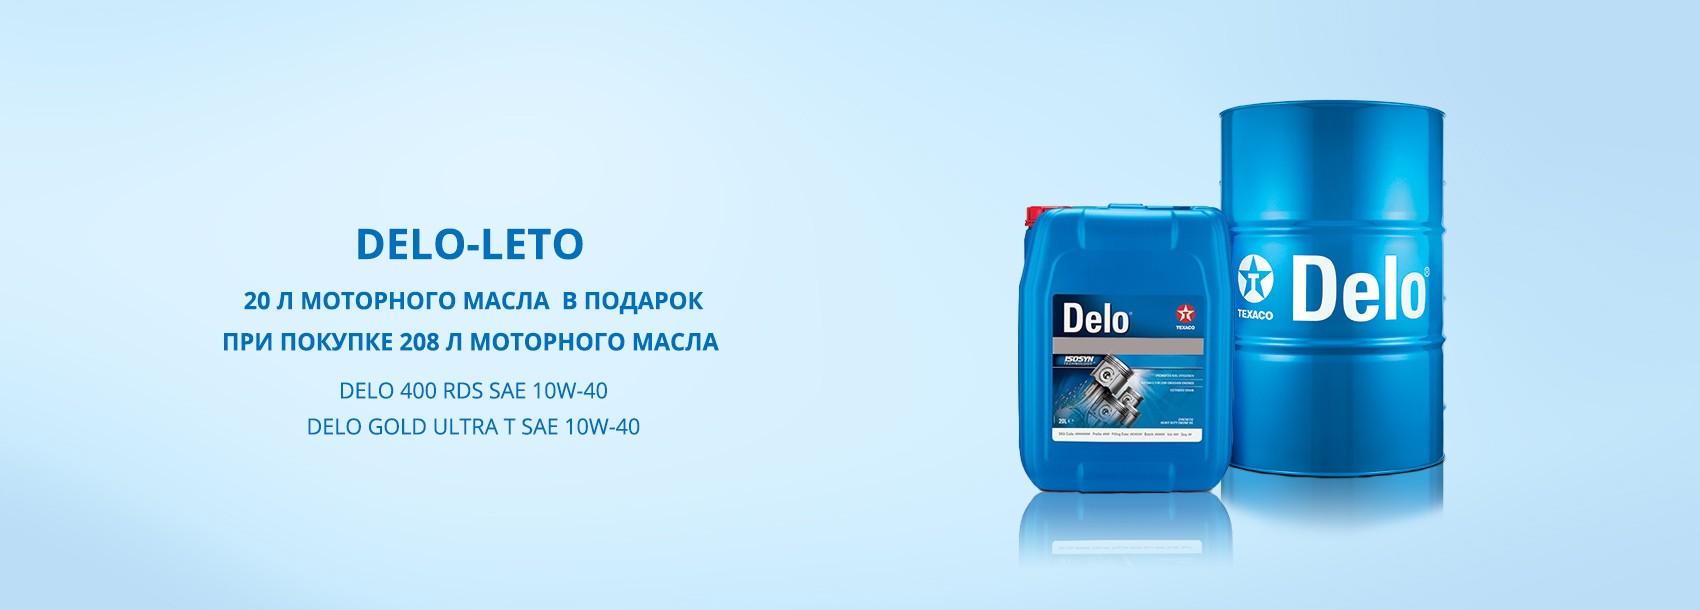 Delo-Leto